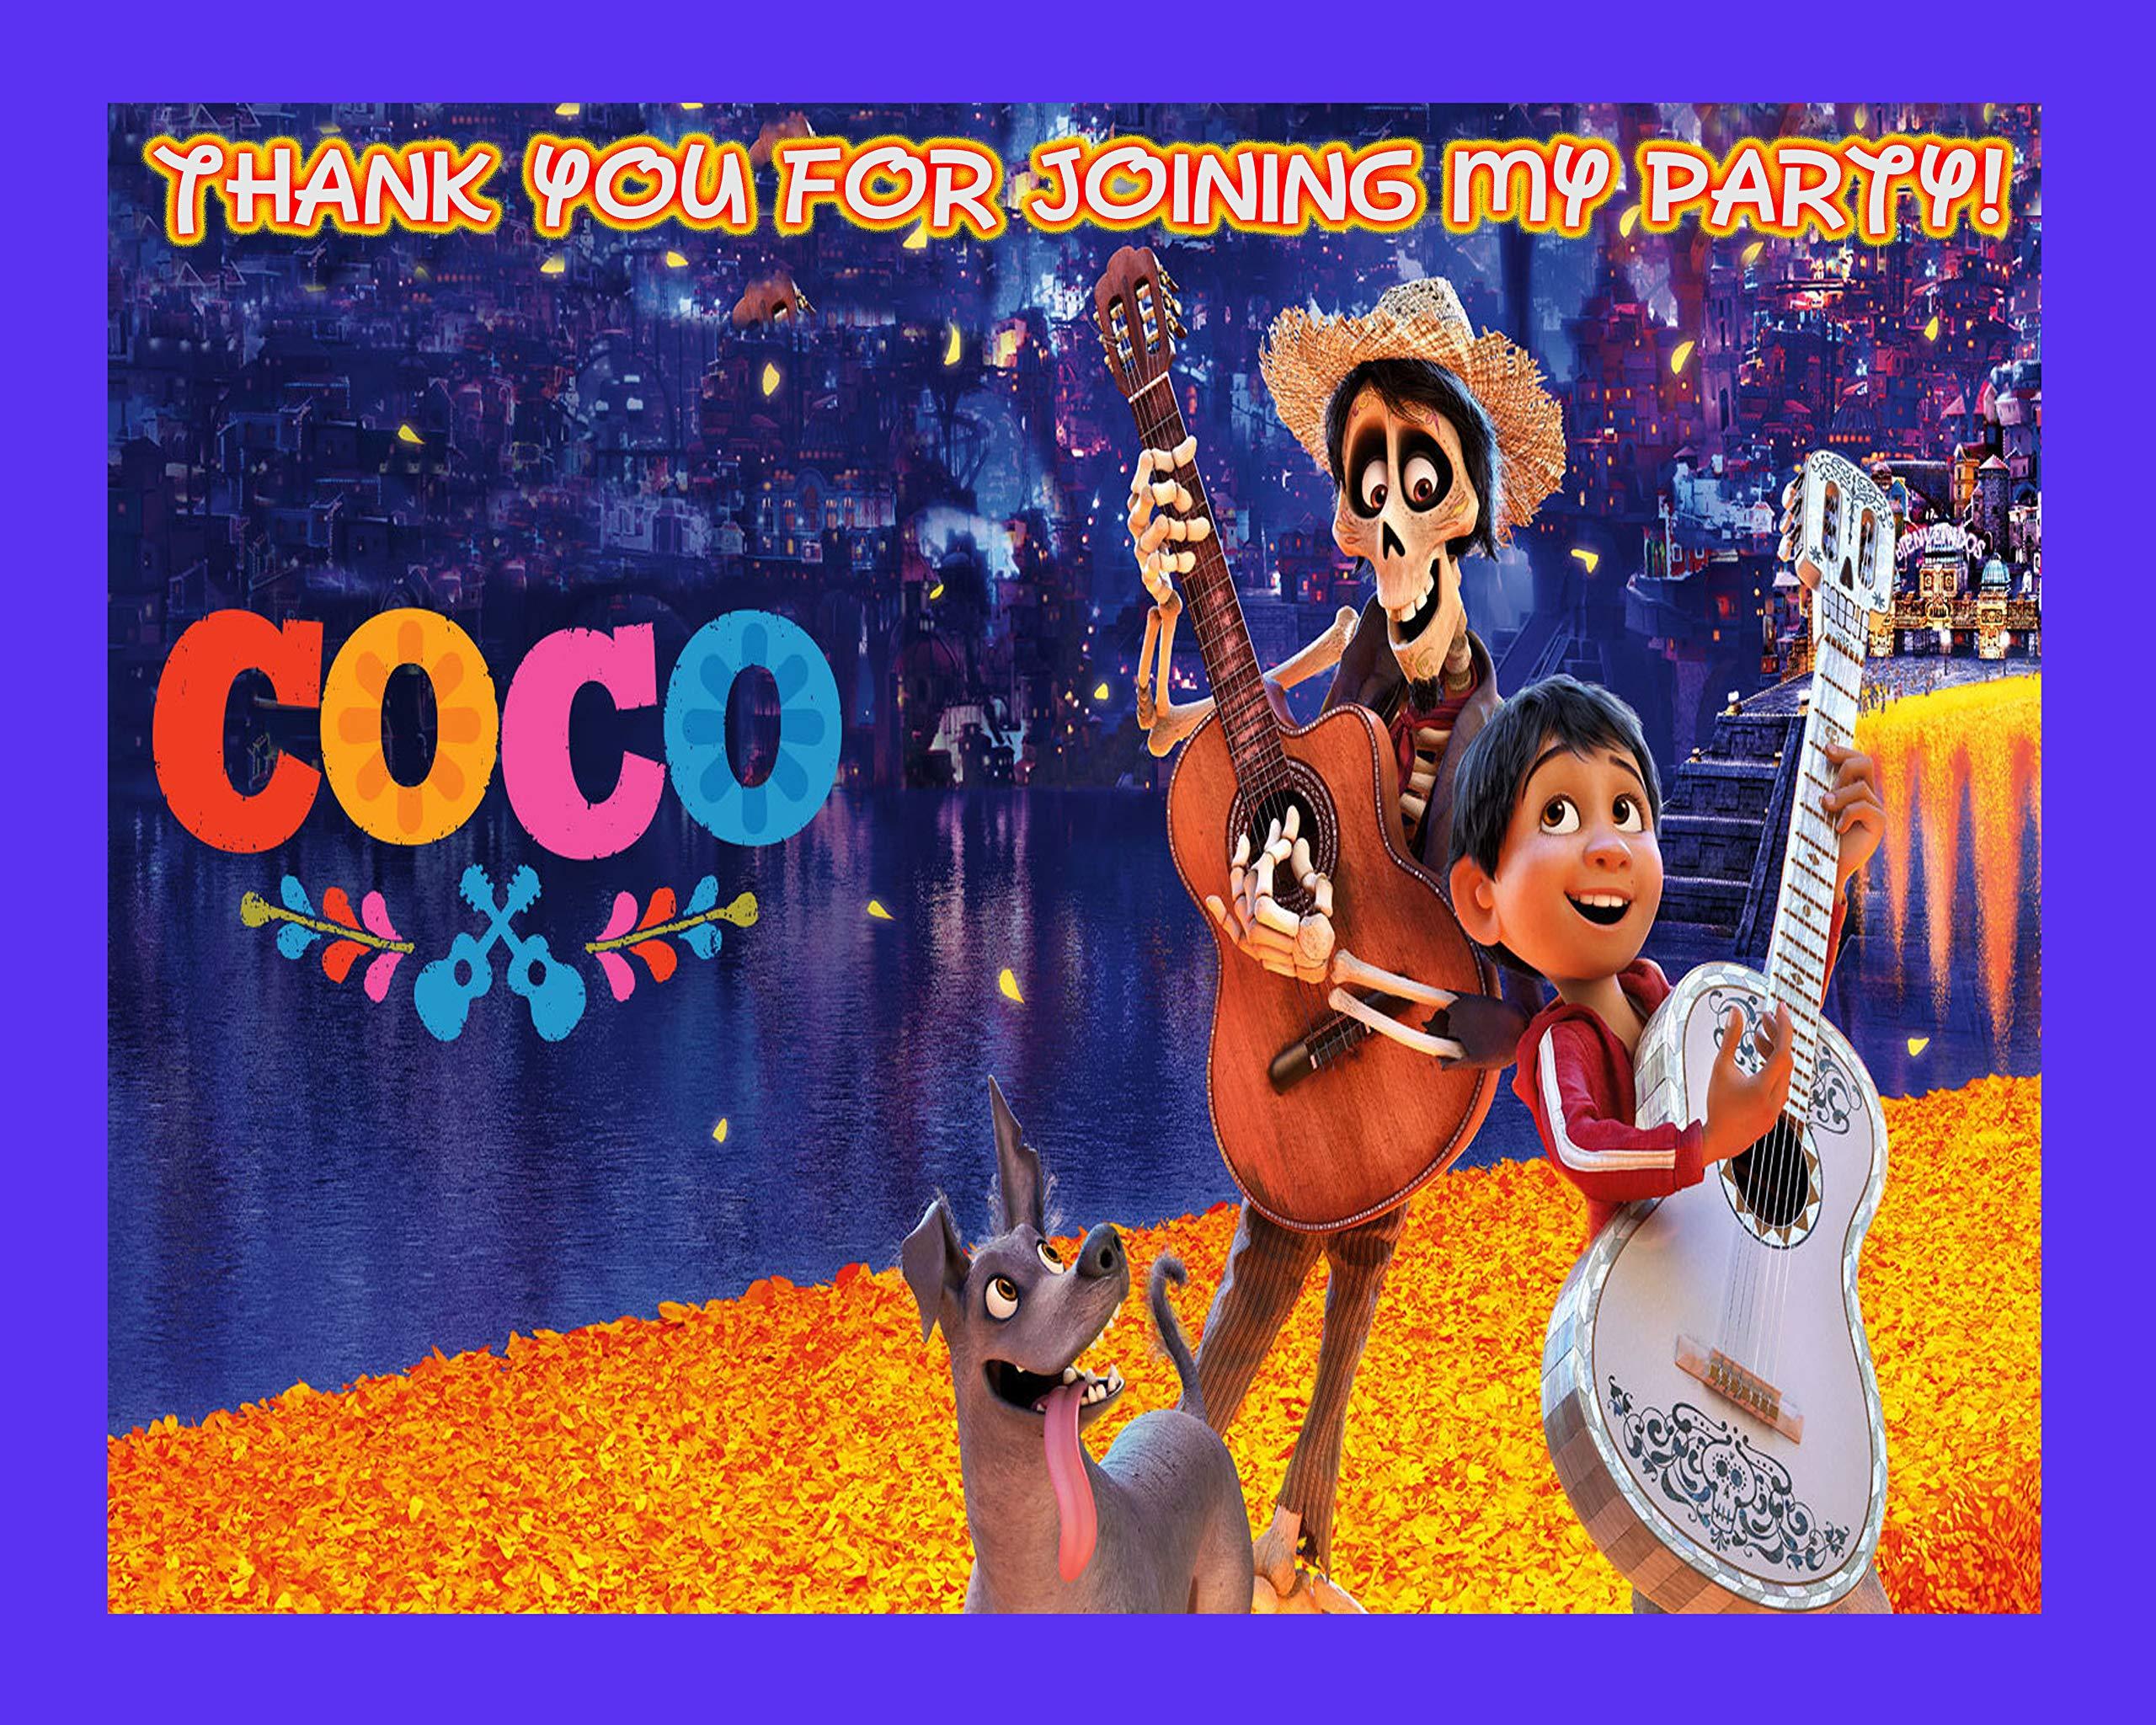 COCO Large Vinyl Indoor or Outdoor Banner Sign Poster Backdrop Decoration, Waterproof Vinyl, 30'' x 24'' (2.5ft x 2ft)